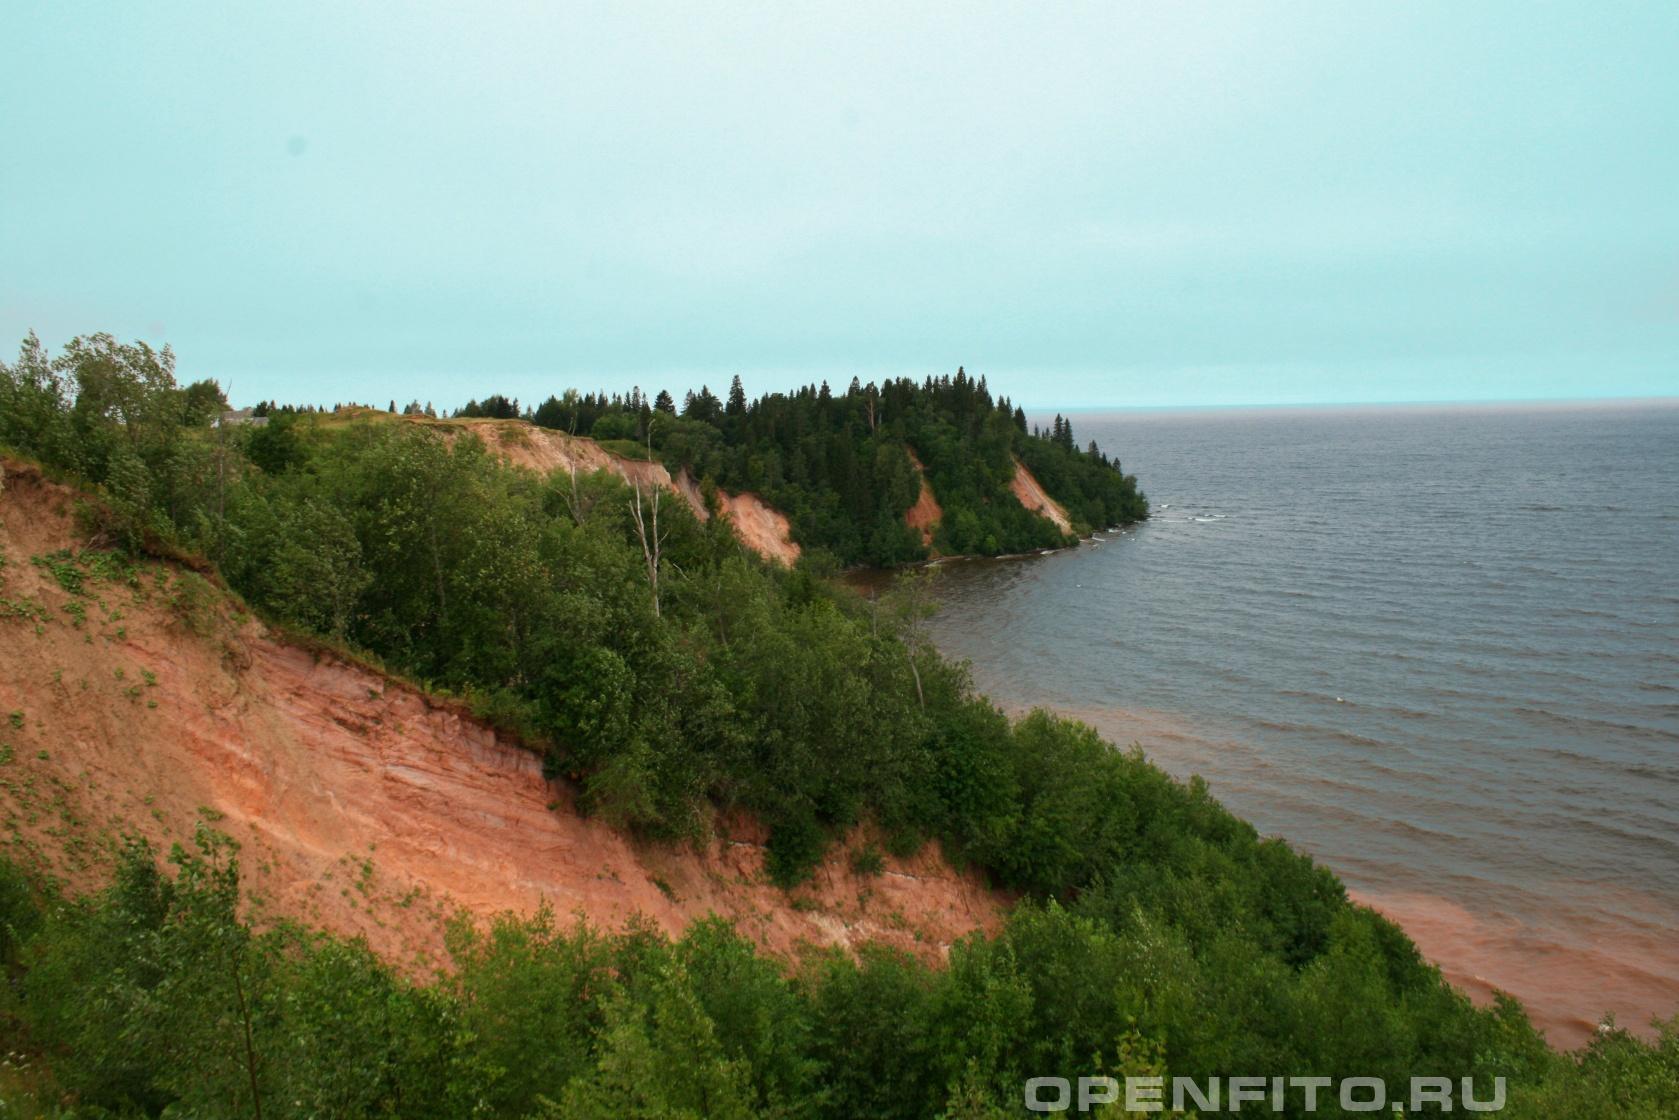 Онежское озеро Берег Онежского озера, Карелия